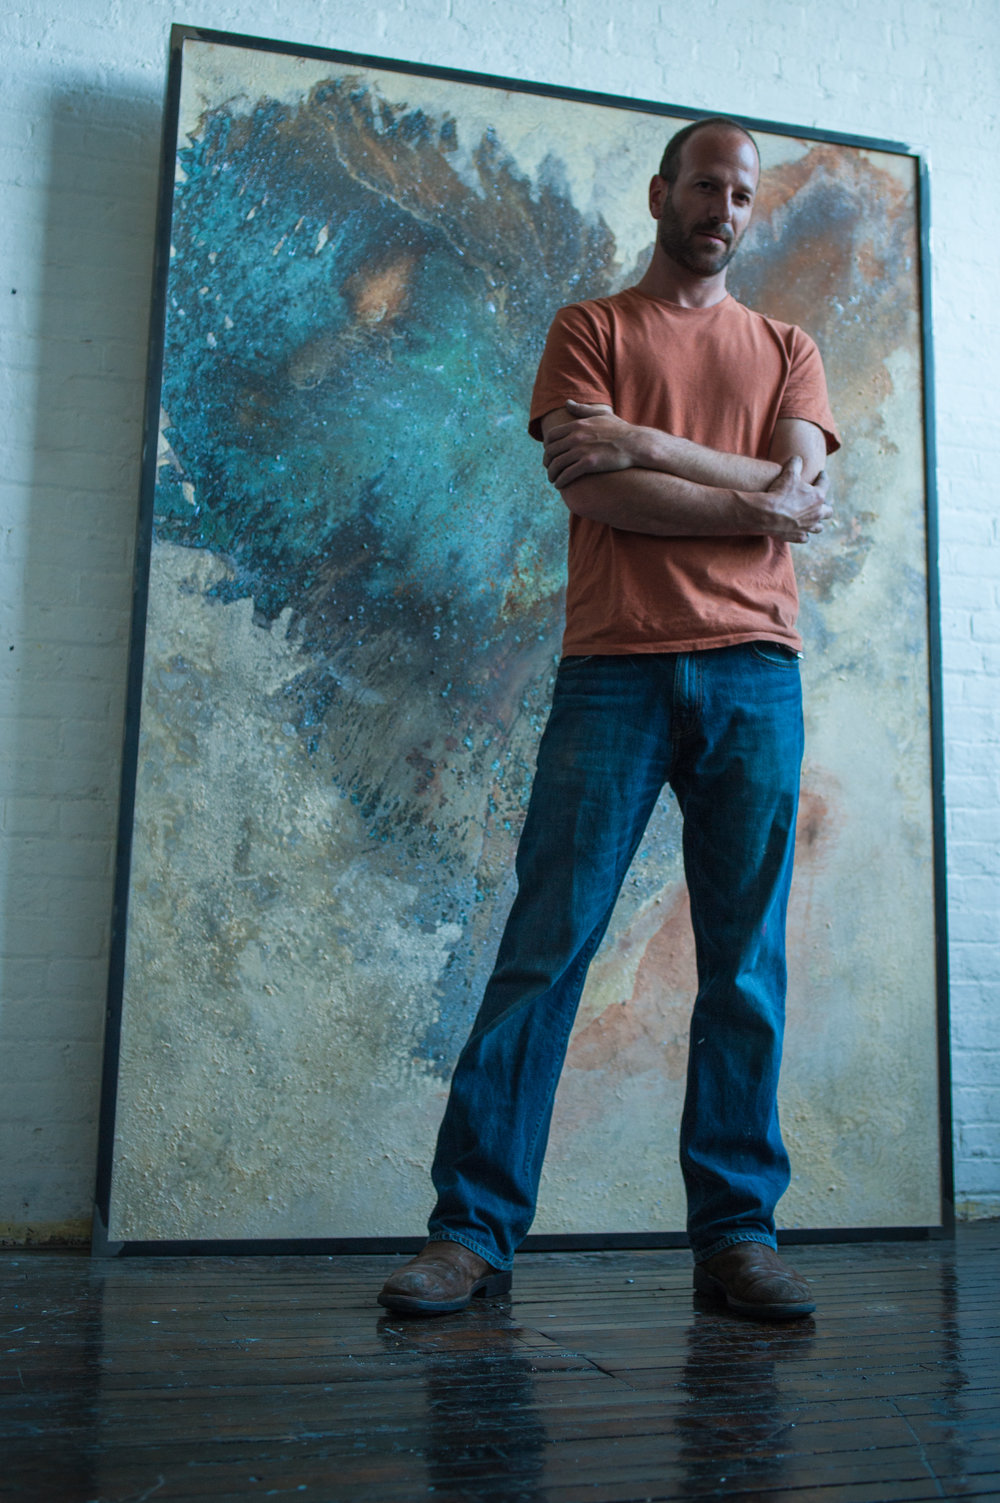 2014 - Paul Seftel, Studio Williamsburg, NY